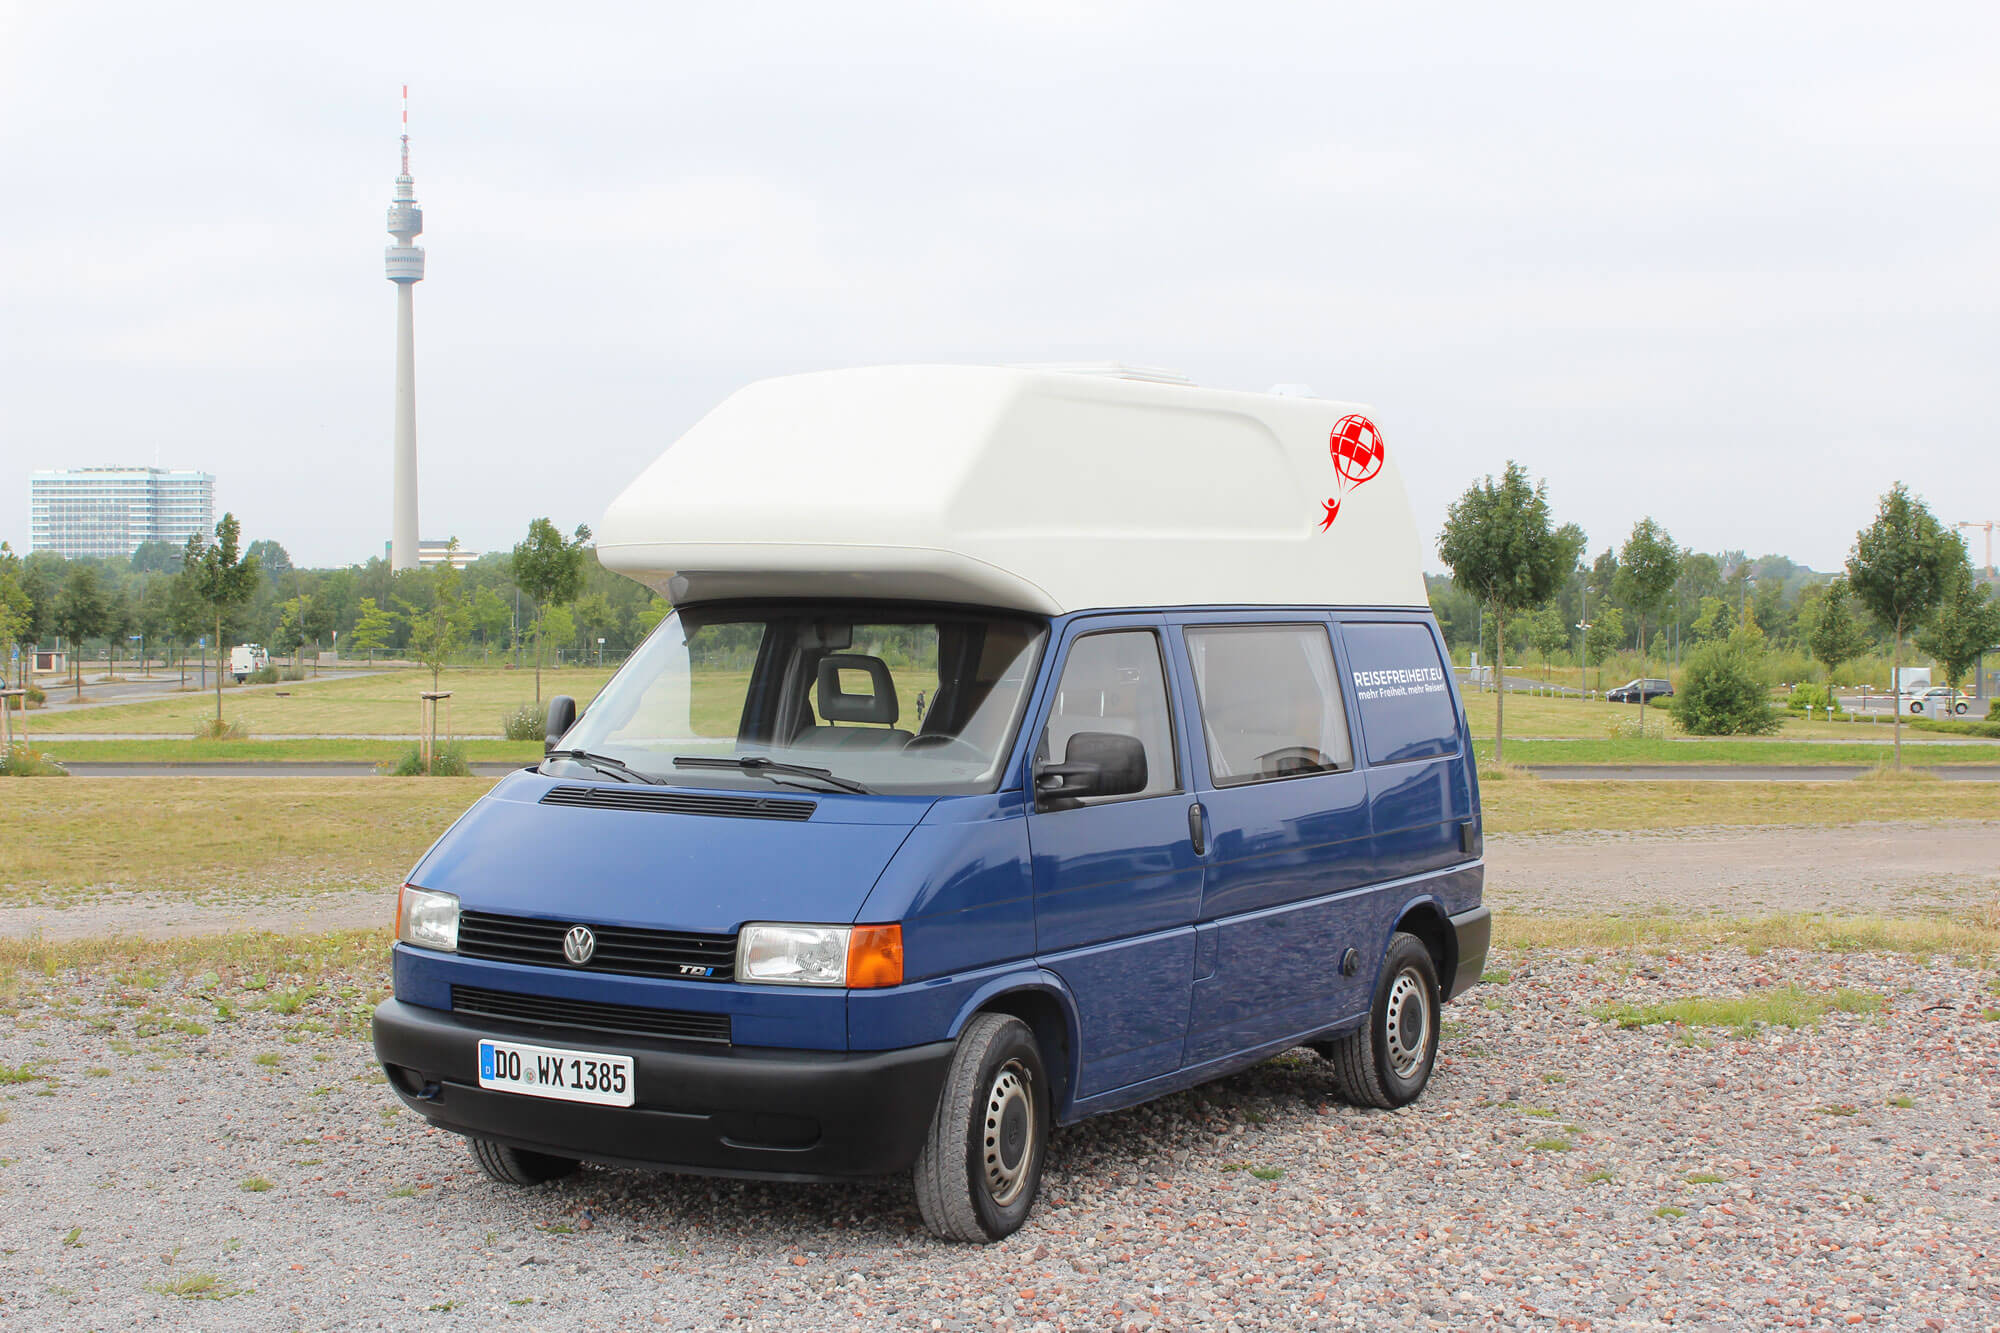 Wohnmobil-Dortmund